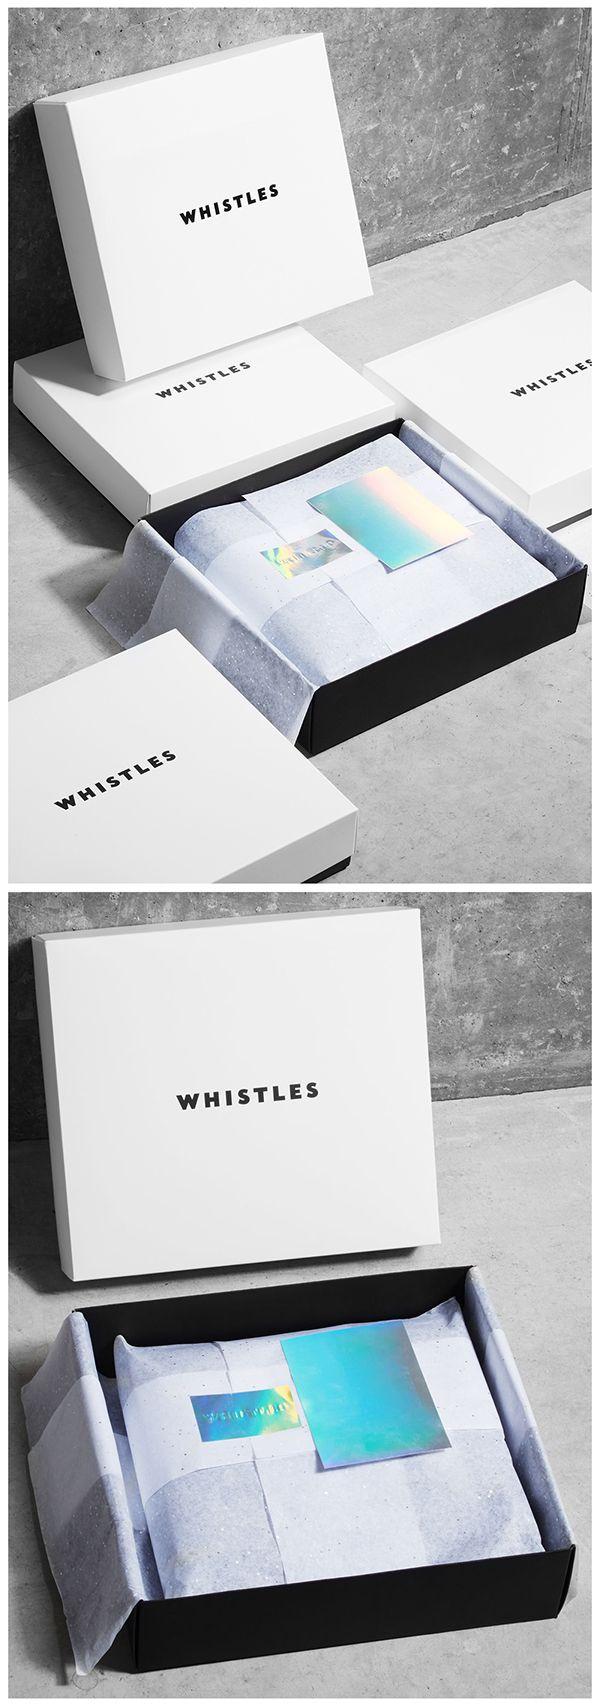 Whistles Christmas 2014 on Behance